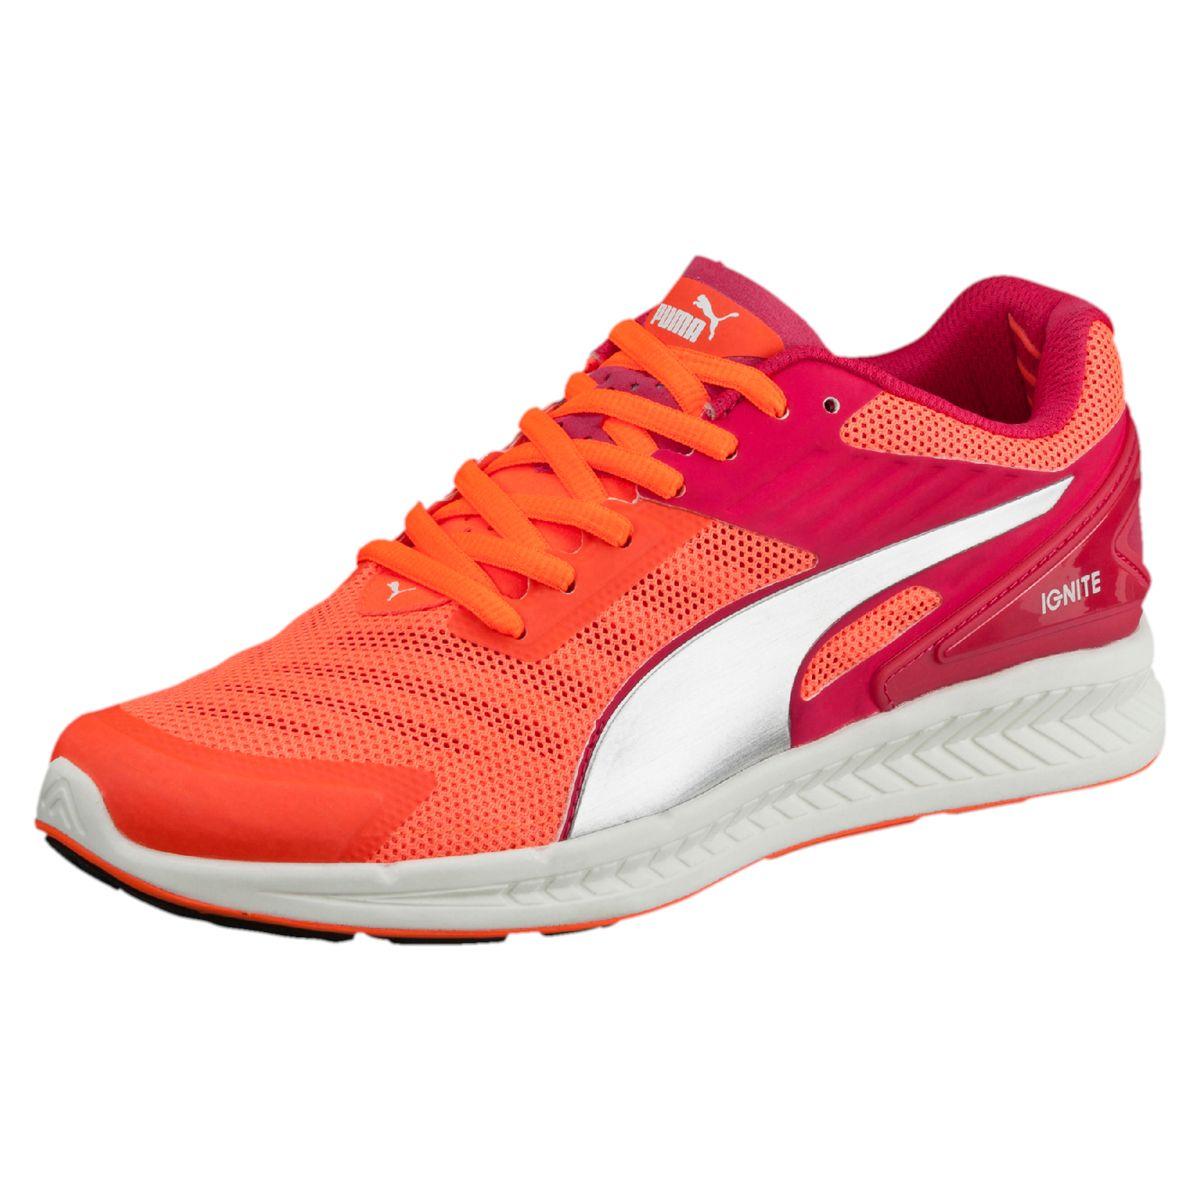 Ladies Boxing Shoes